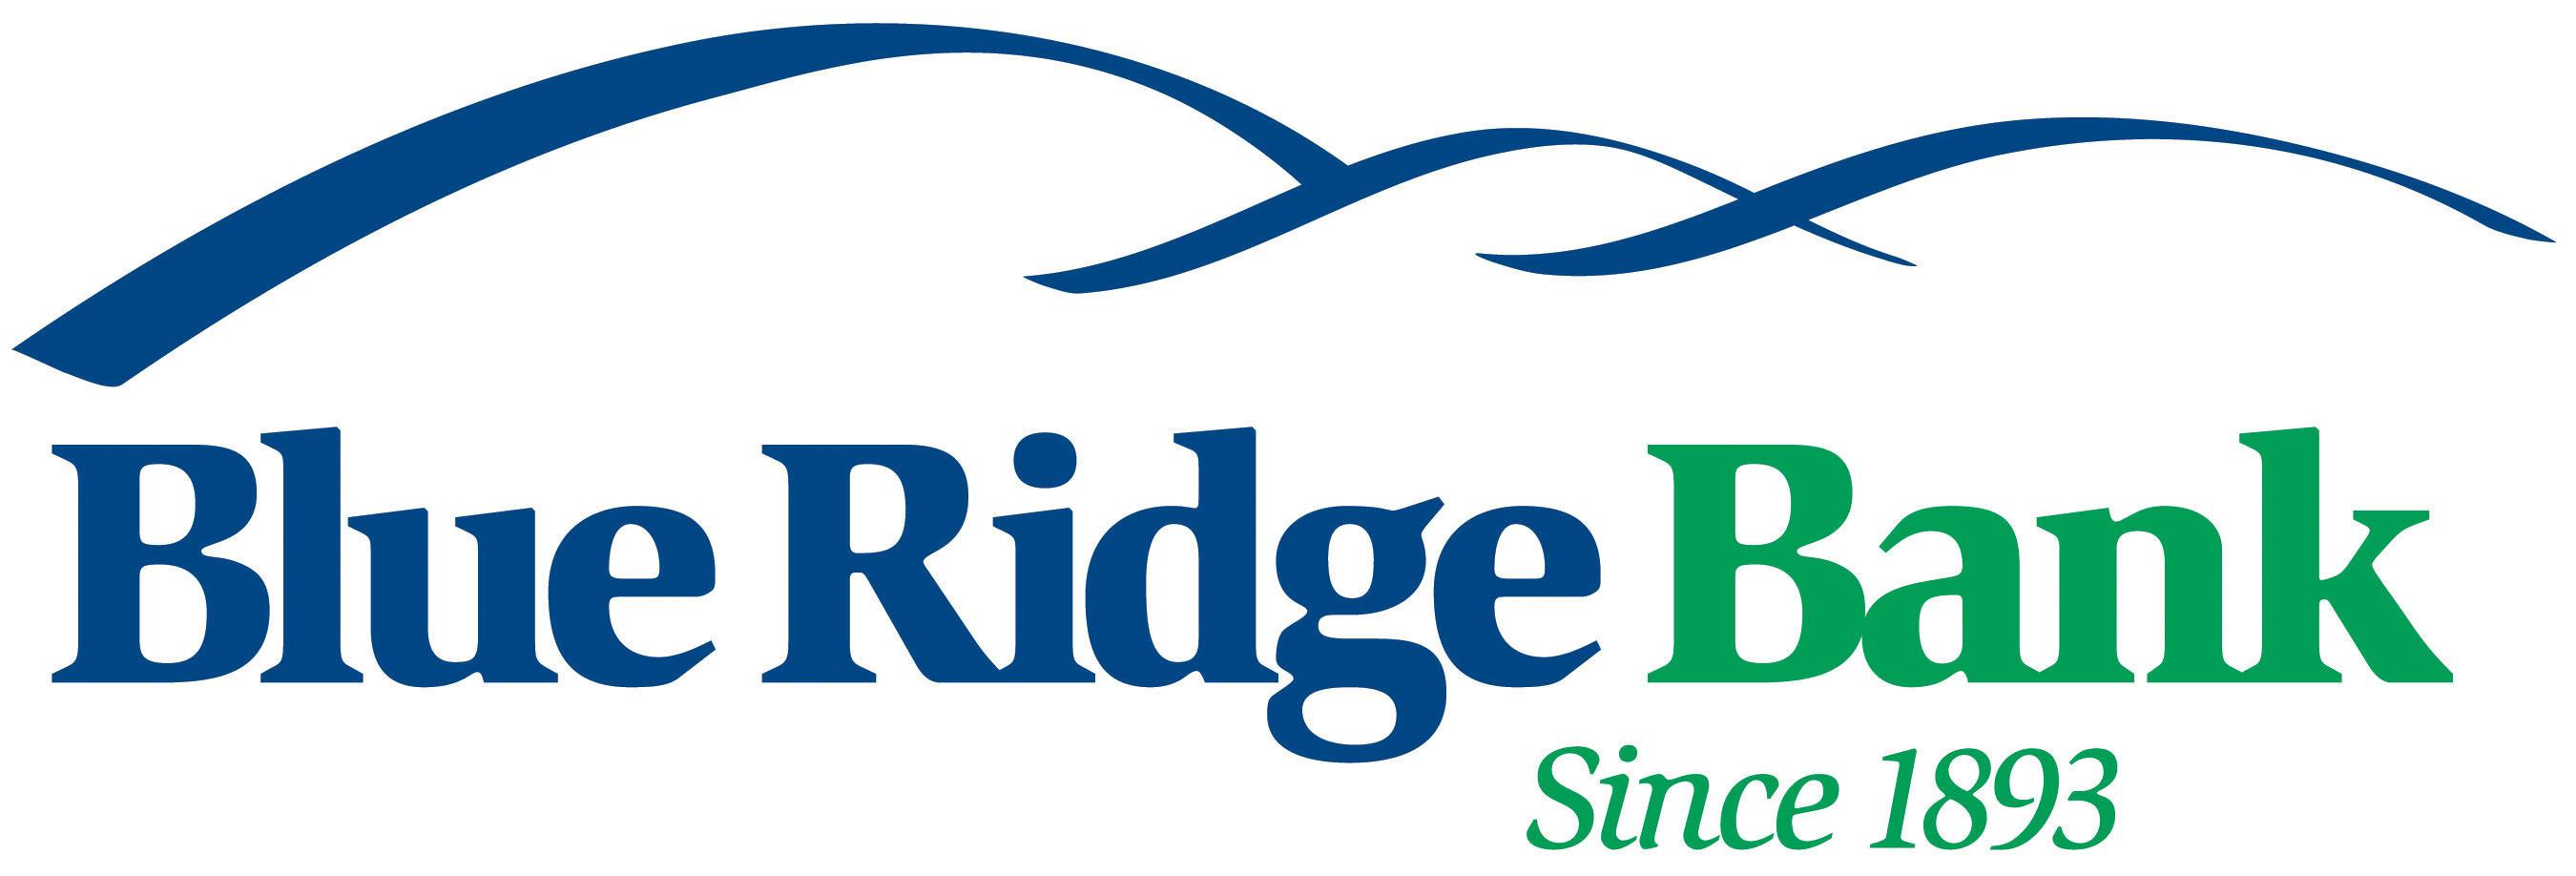 Blue Ridge Bank, since 1893